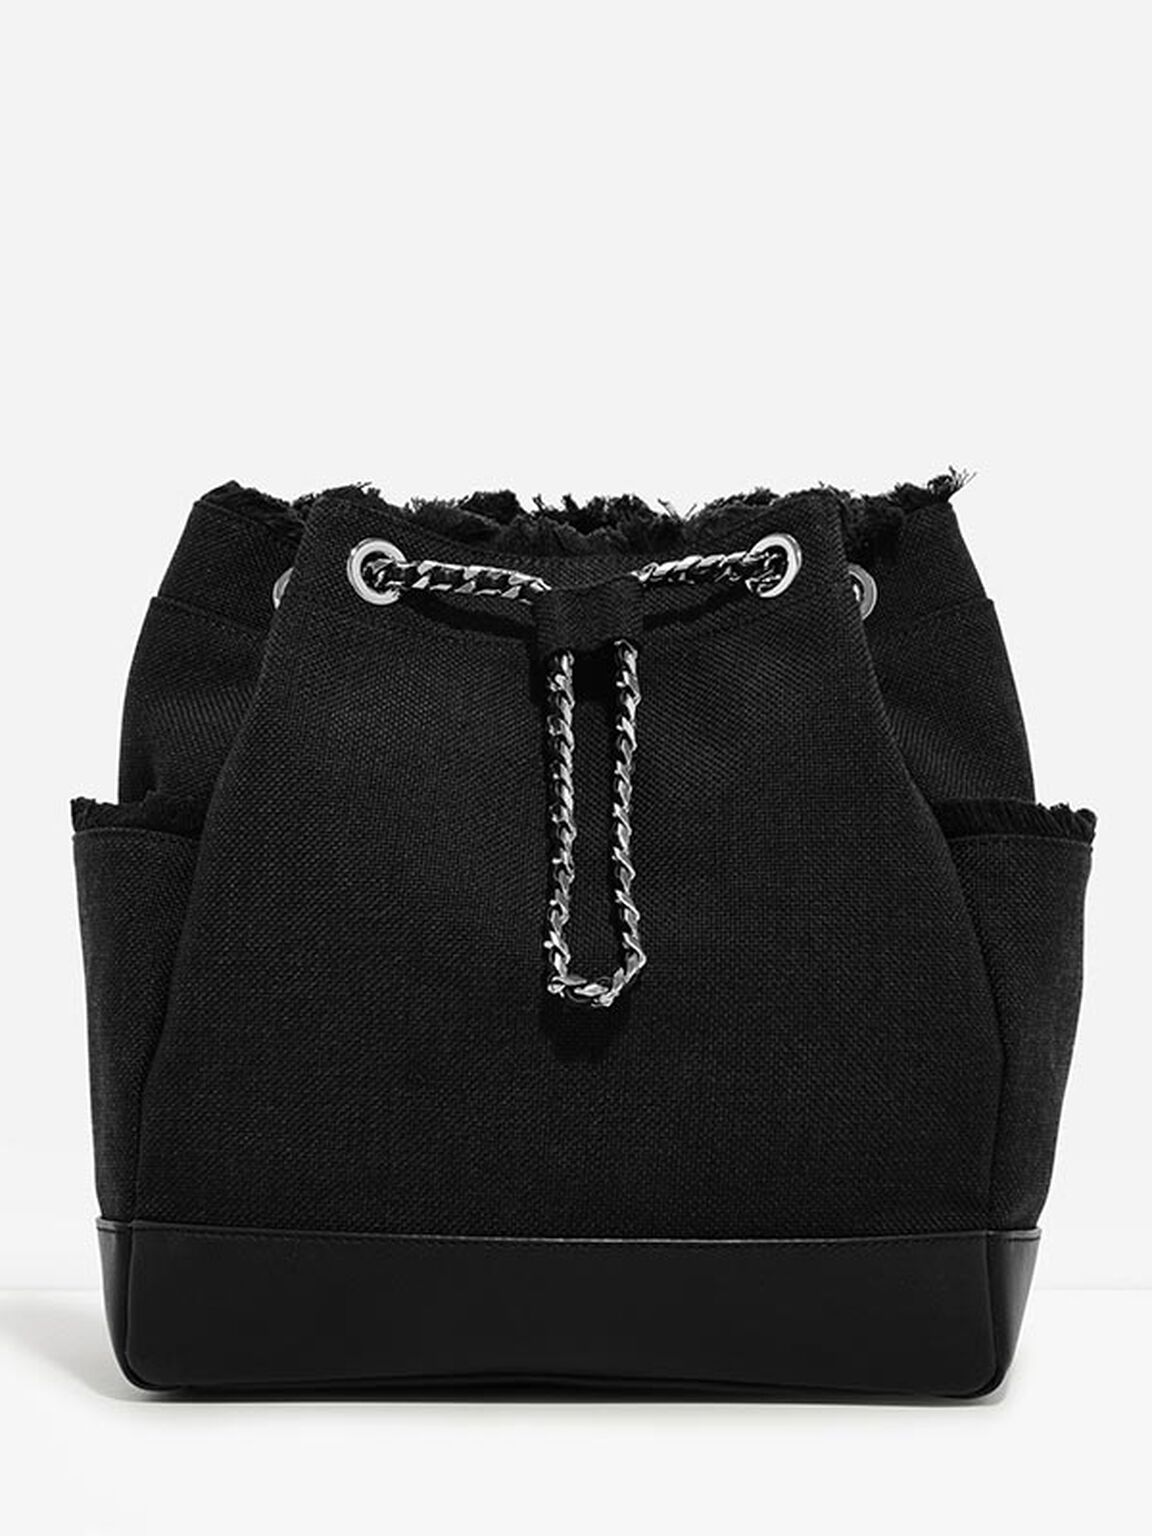 Bucket Shoulder Bag, Black, hi-res